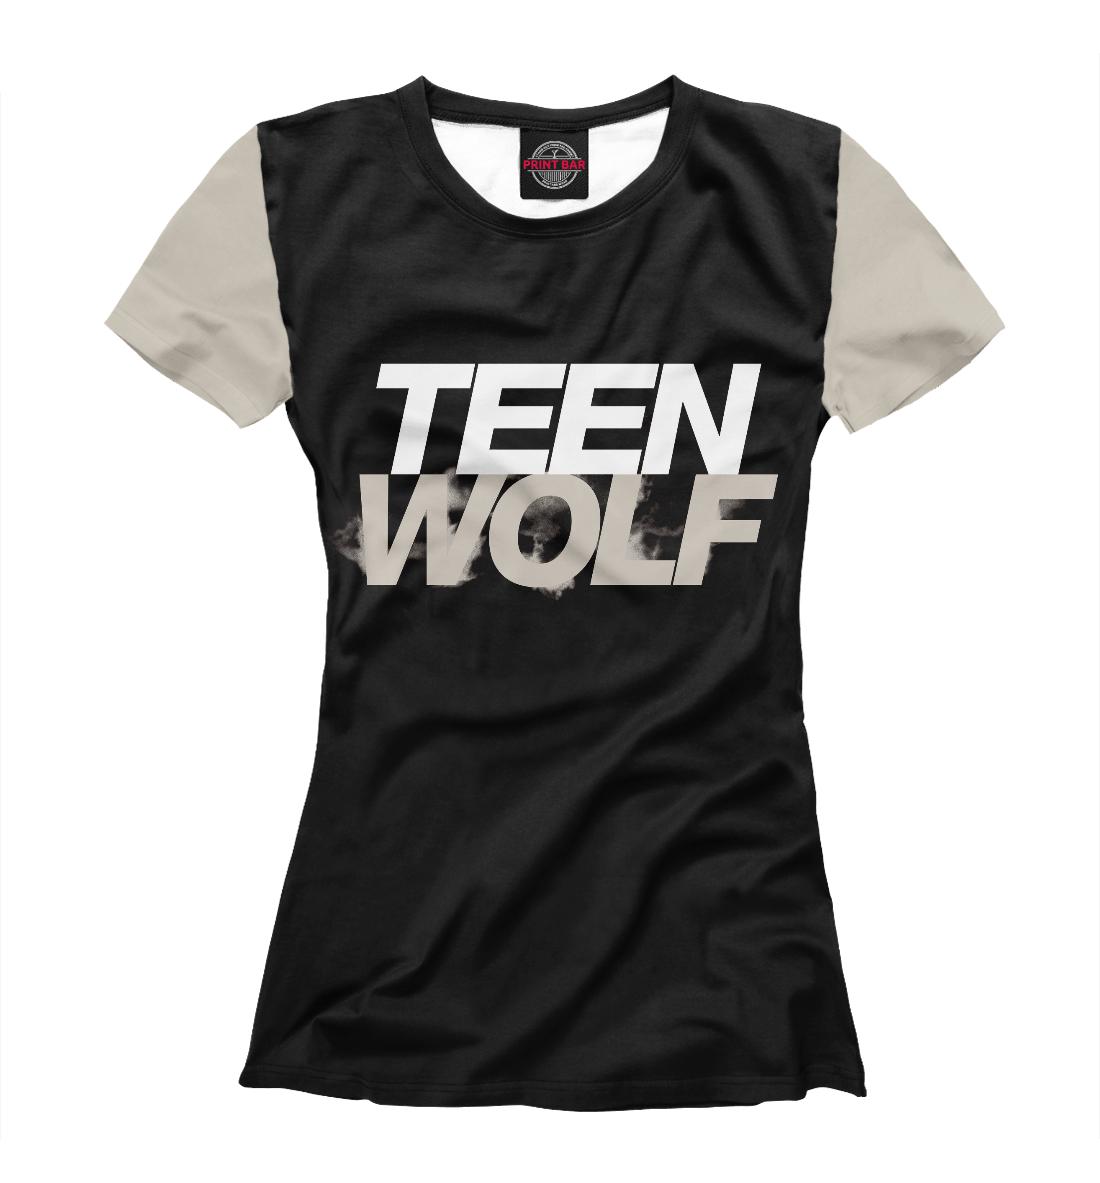 Купить Teen Wolf, Printbar, Футболки, TWF-367139-fut-1